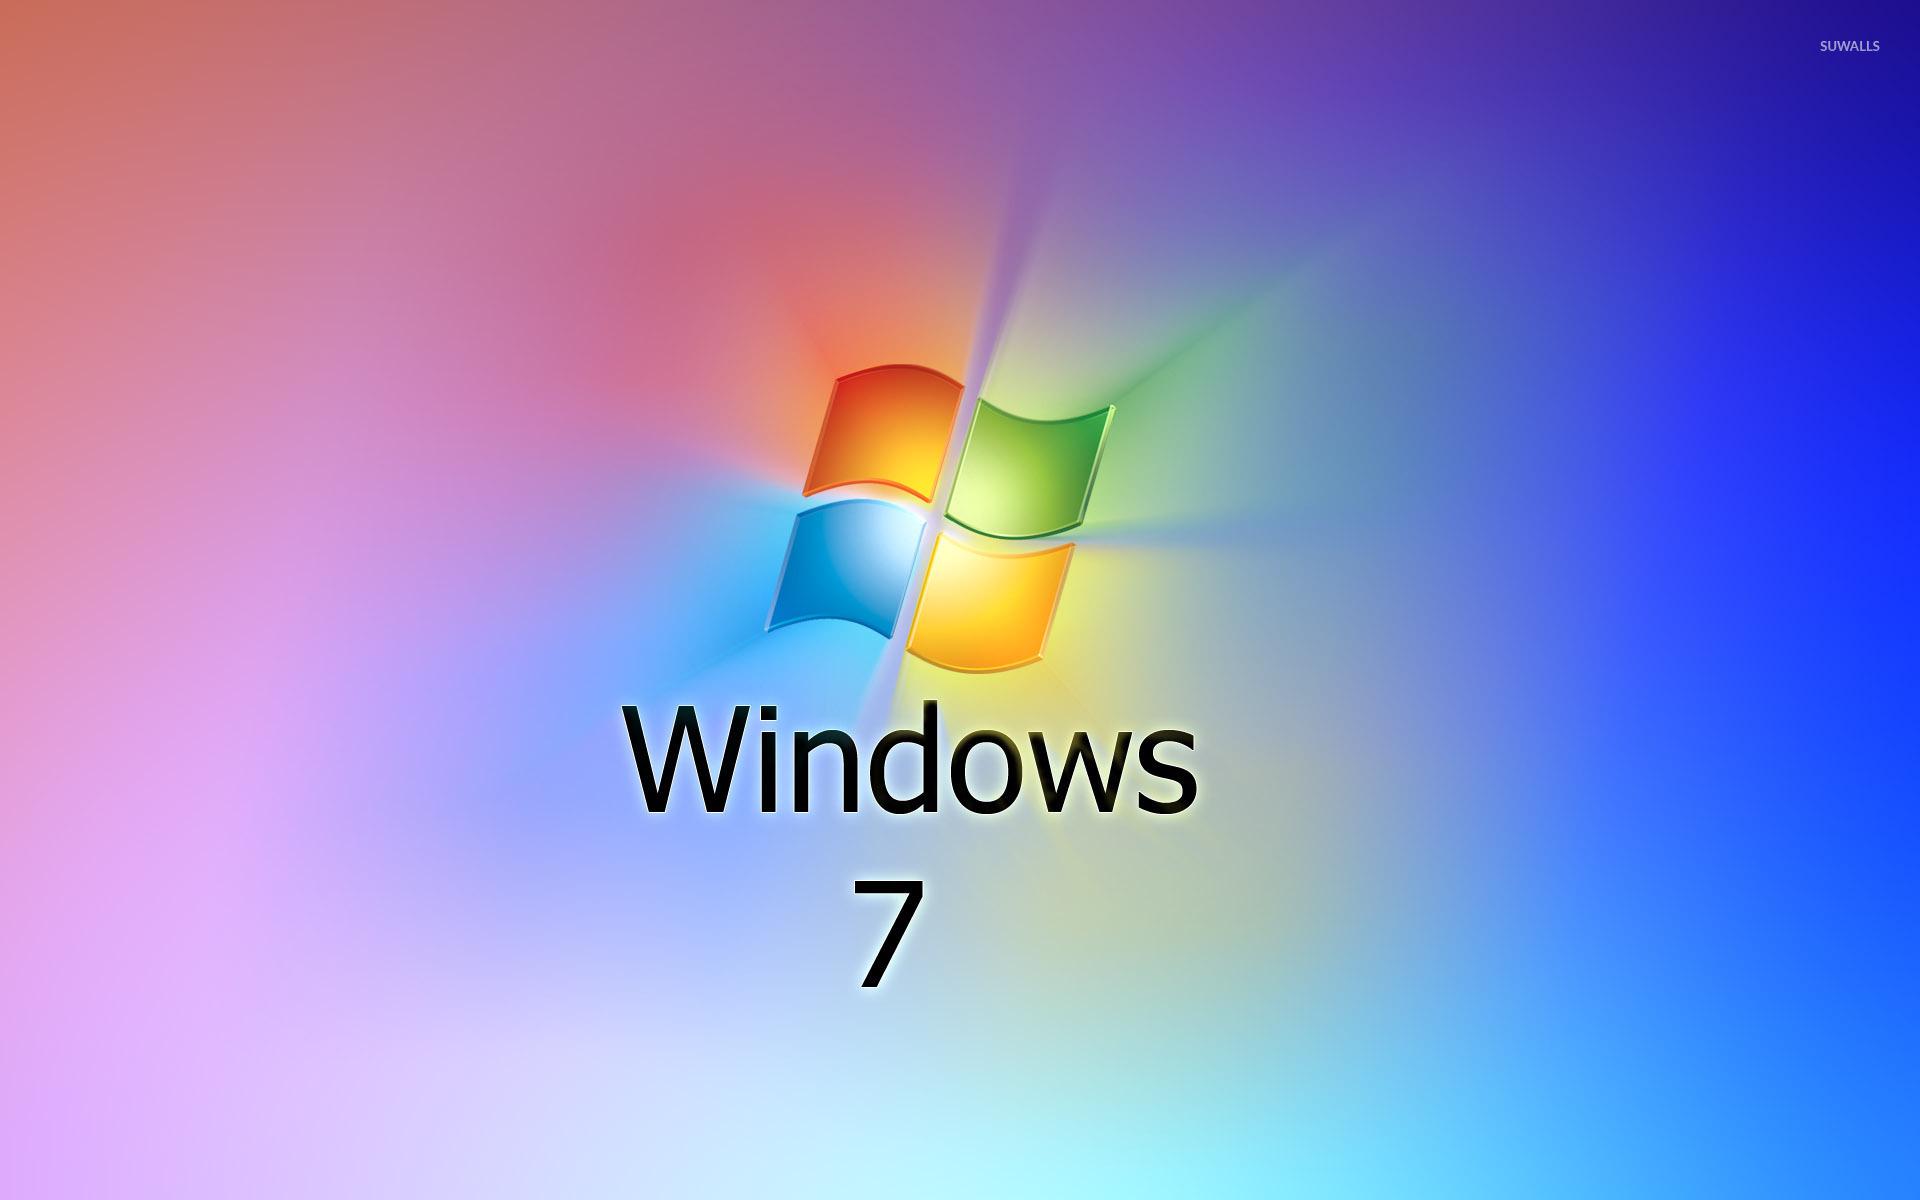 windows 7 26 wallpaper computer wallpapers 94